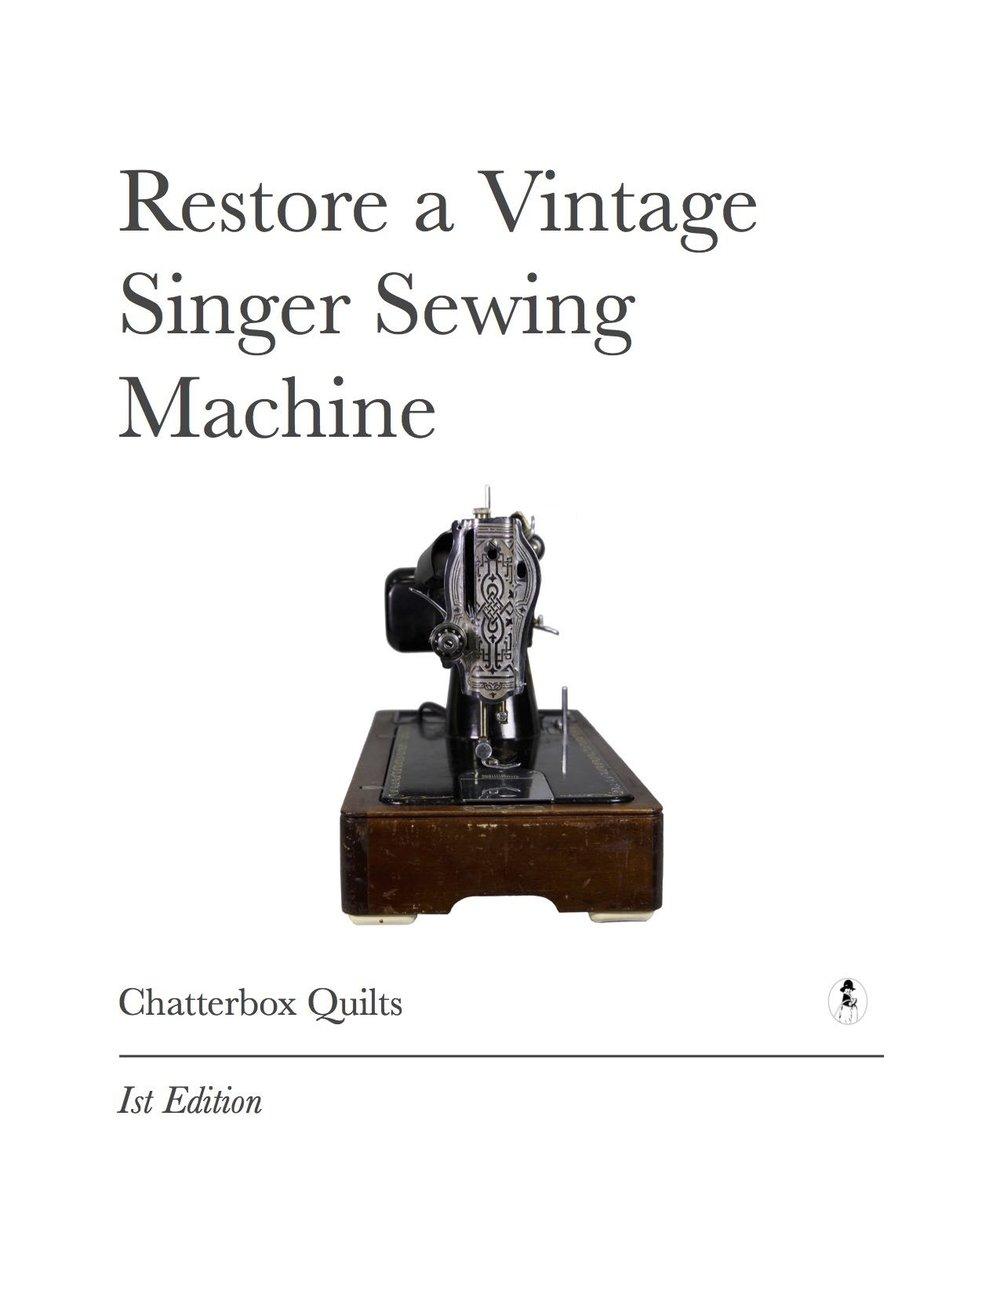 Restore a VIntage Singer Sewing Machine Ebook Cover.jpg